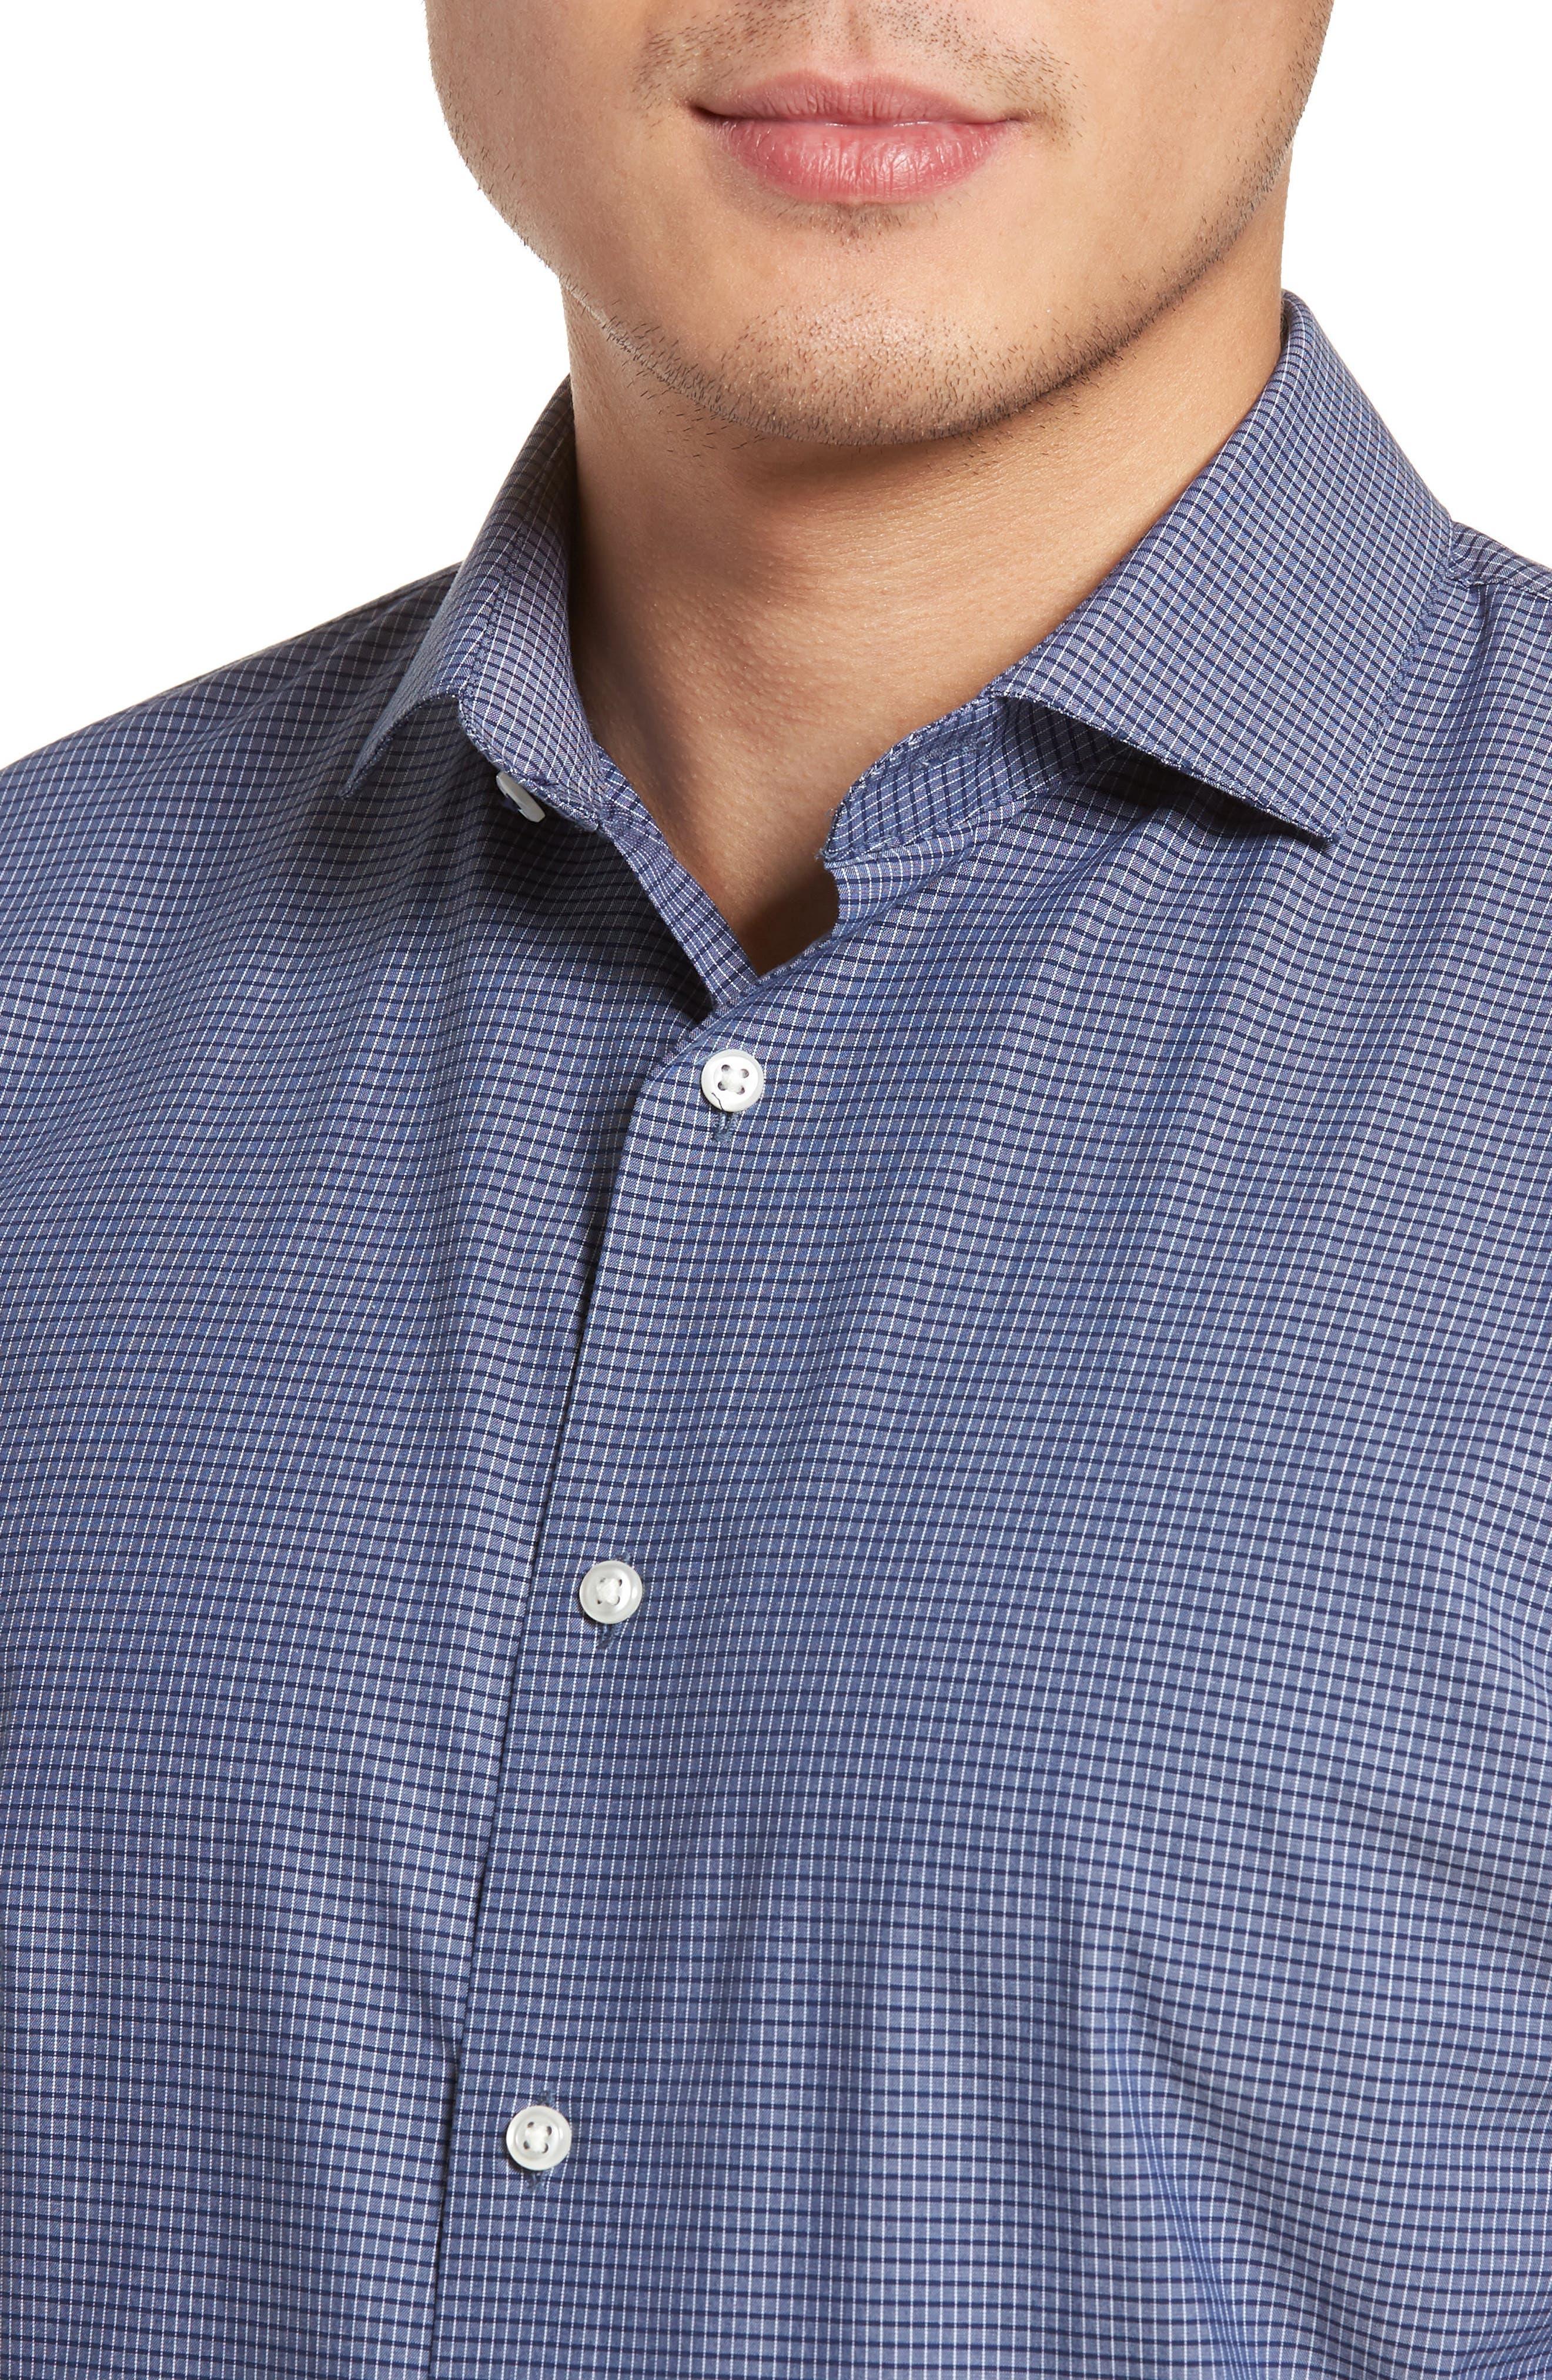 Tech-Smart Trim Fit Stretch Check Dress Shirt,                             Alternate thumbnail 2, color,                             410